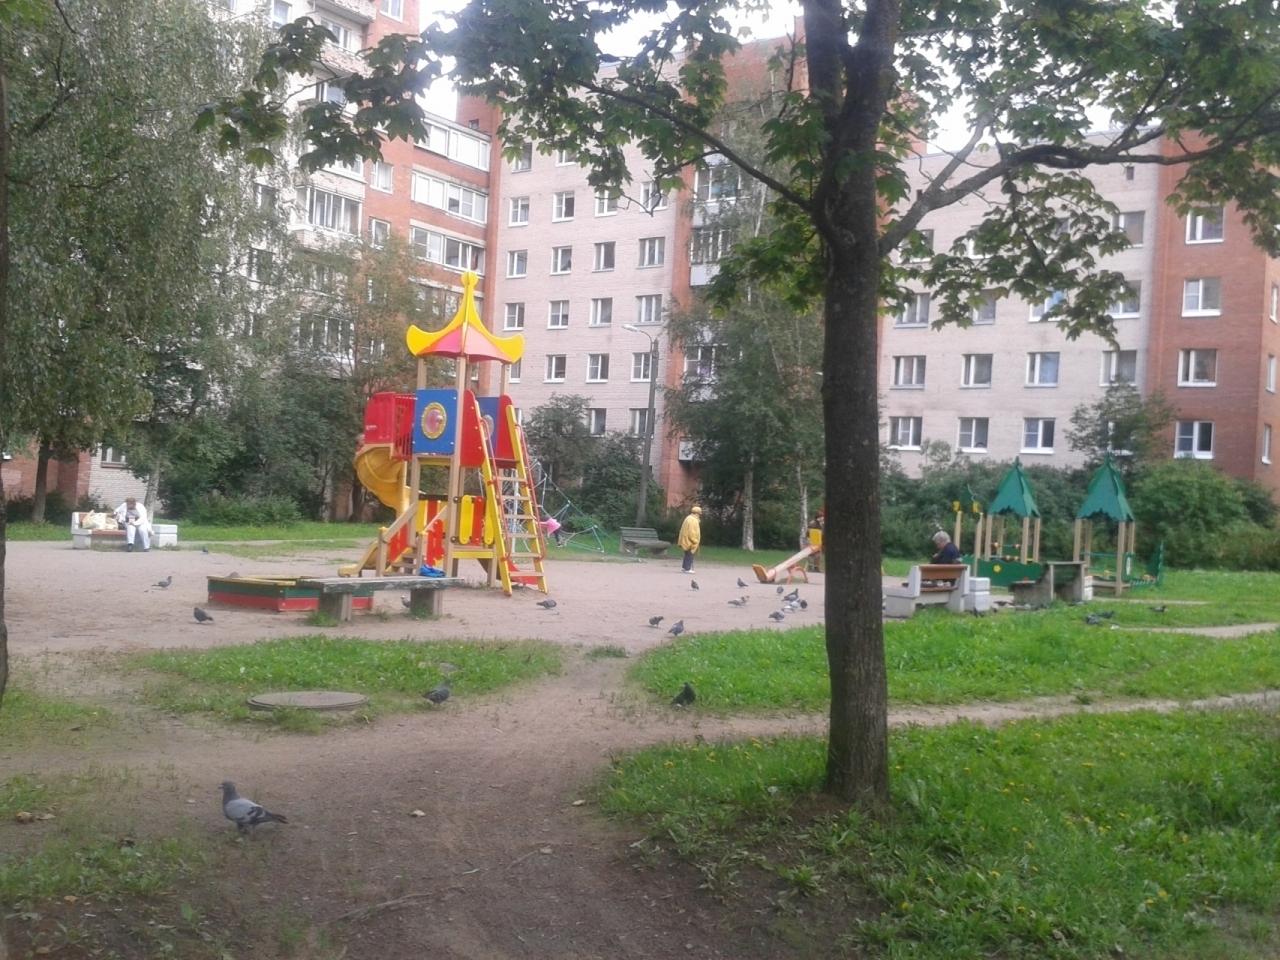 http://arendaspb24.pro.bkn.ru/images/s_big/9c5bfb0f-49fc-11e7-b2d5-448a5bd44c07.jpg